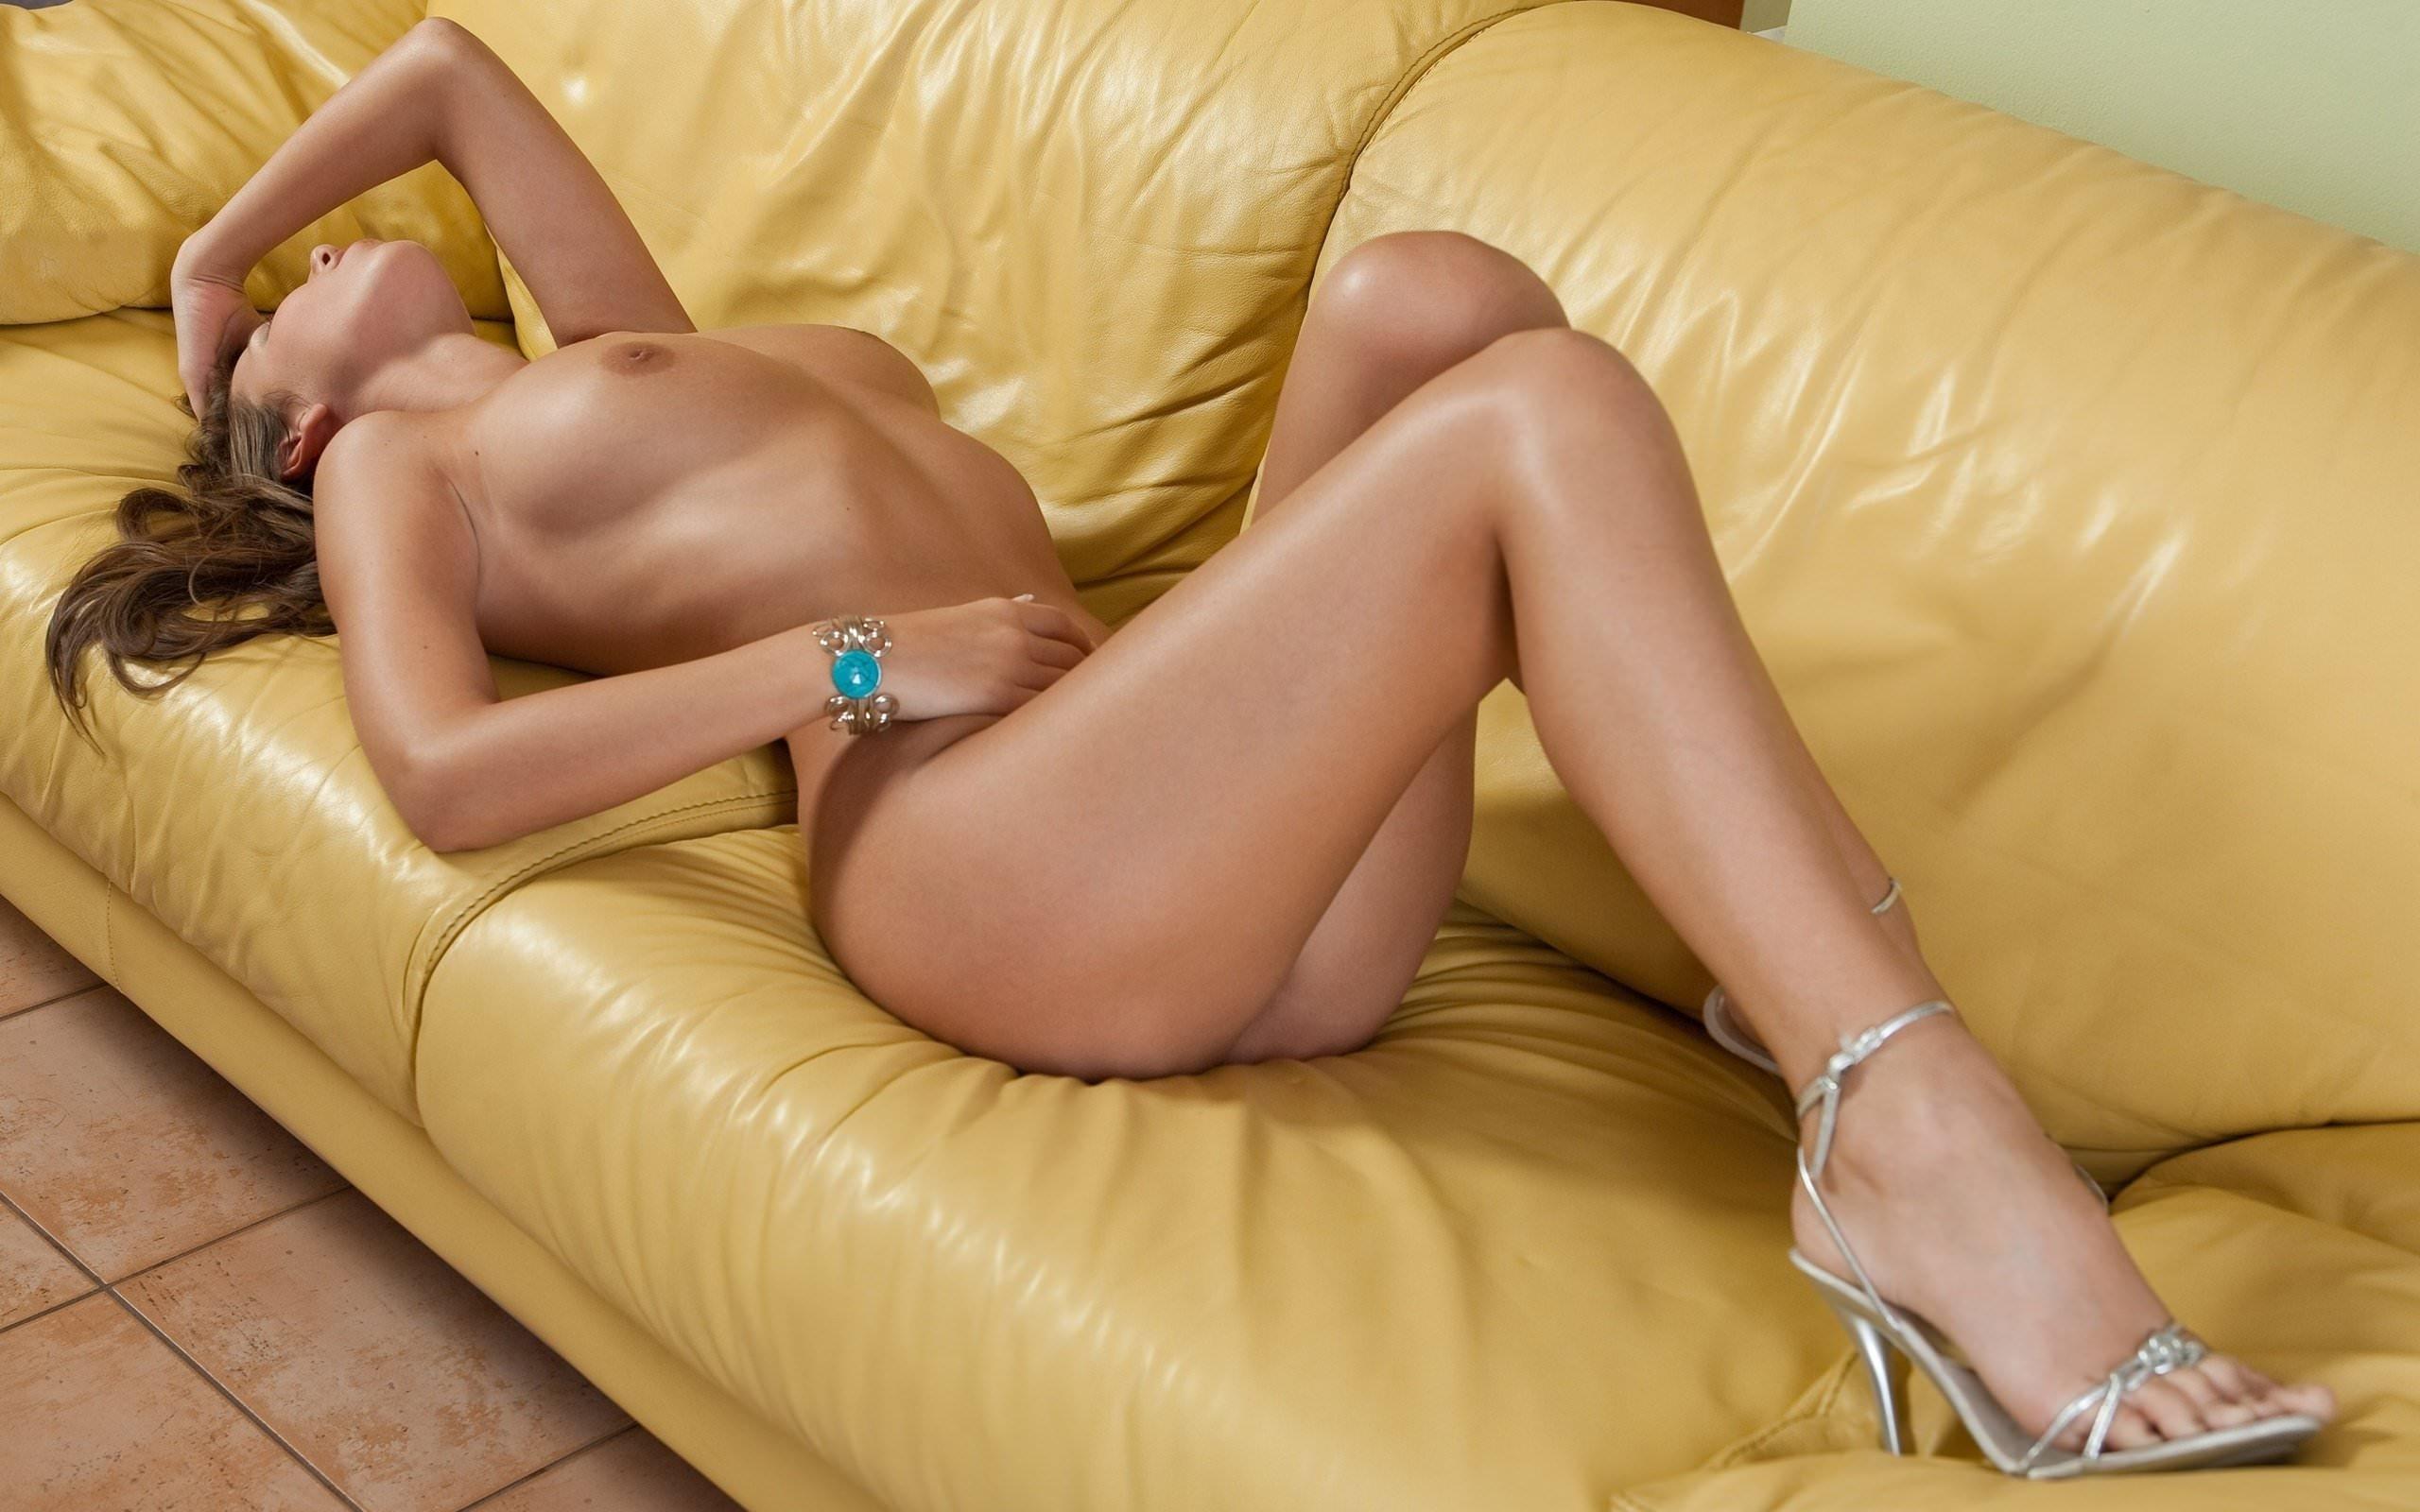 Порно желтый диван бесплатно